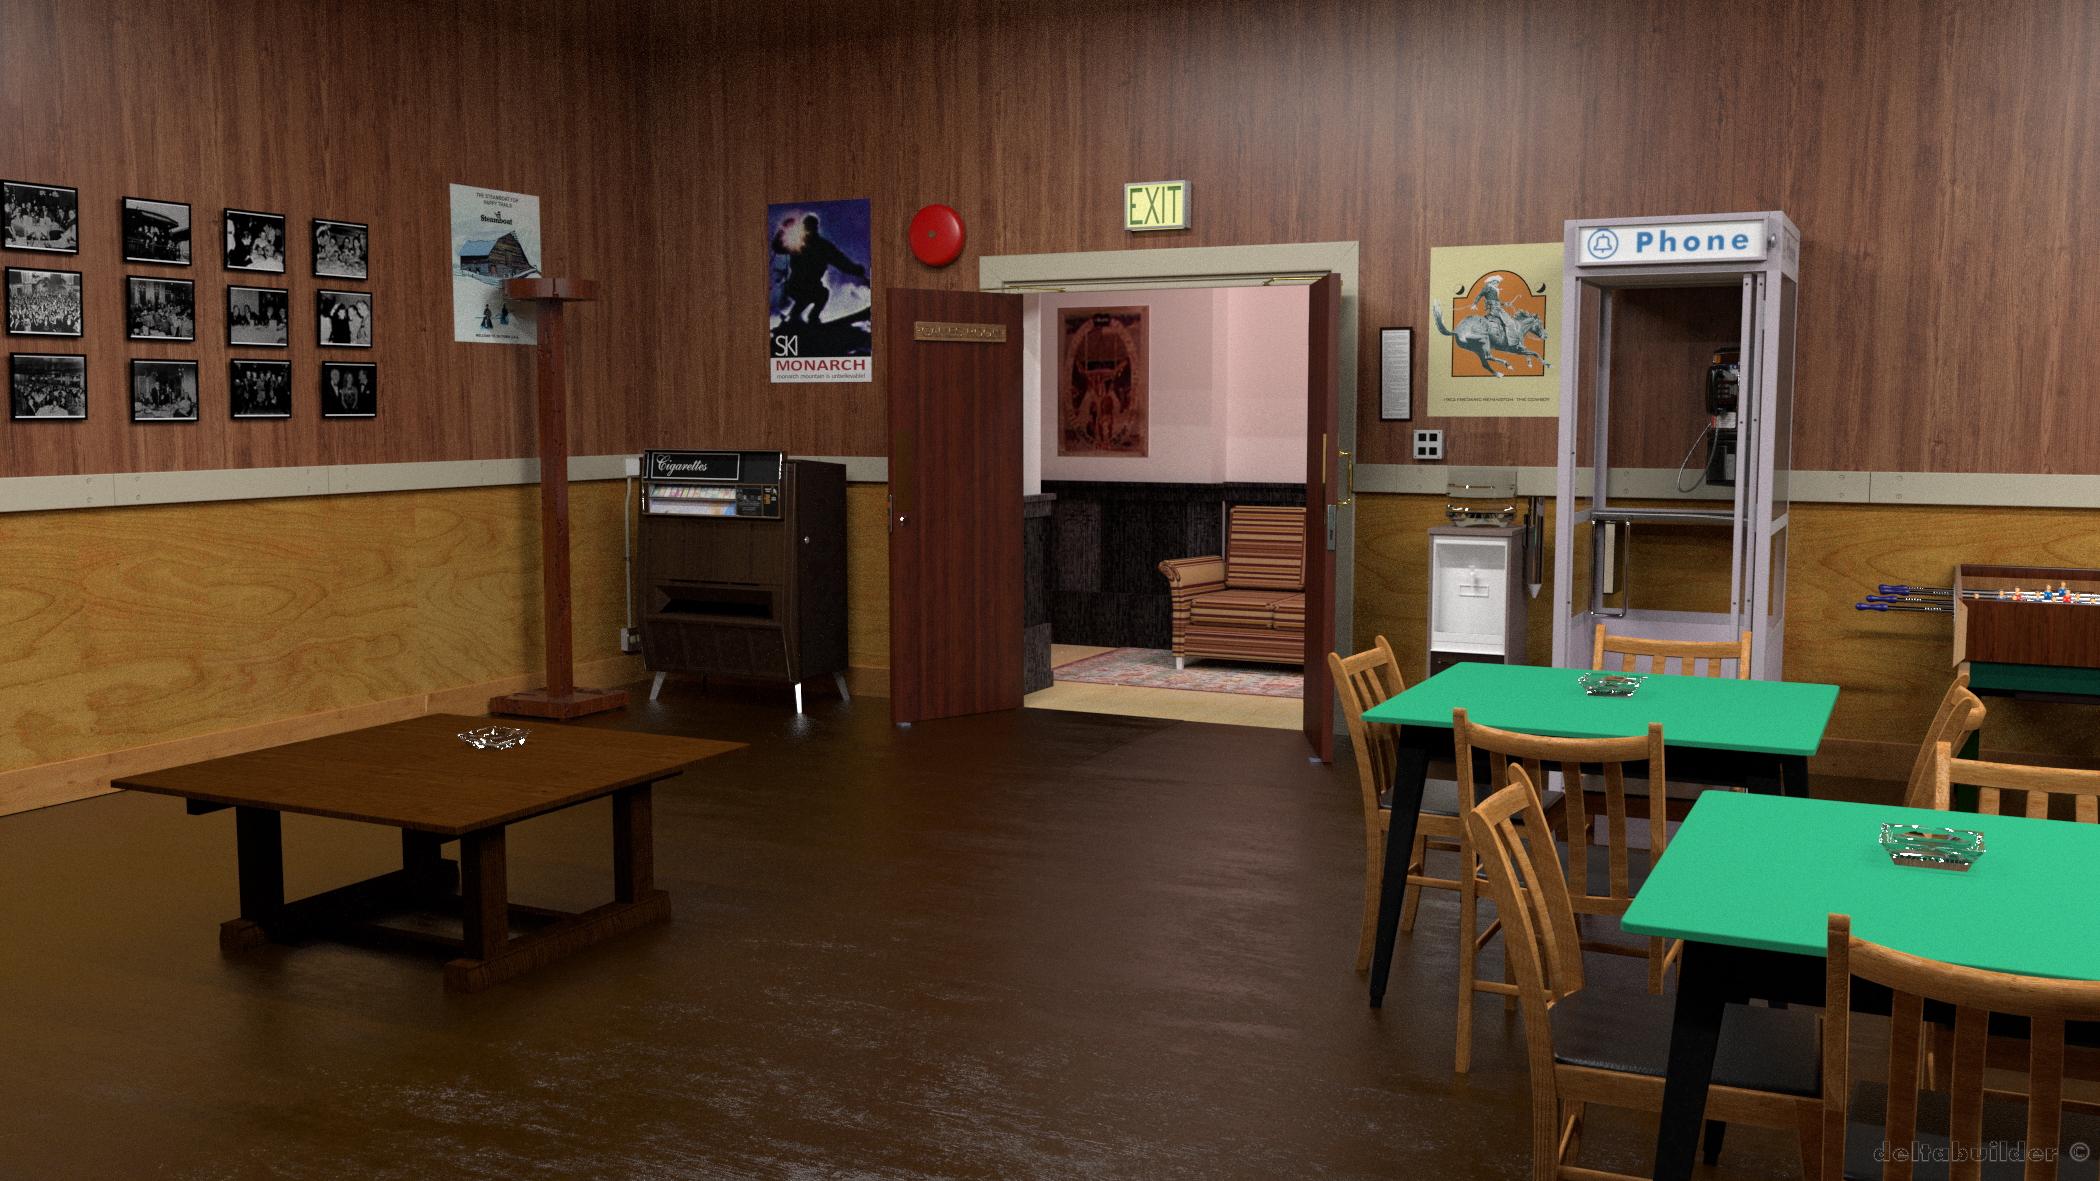 Gamesroom in one of the workshops